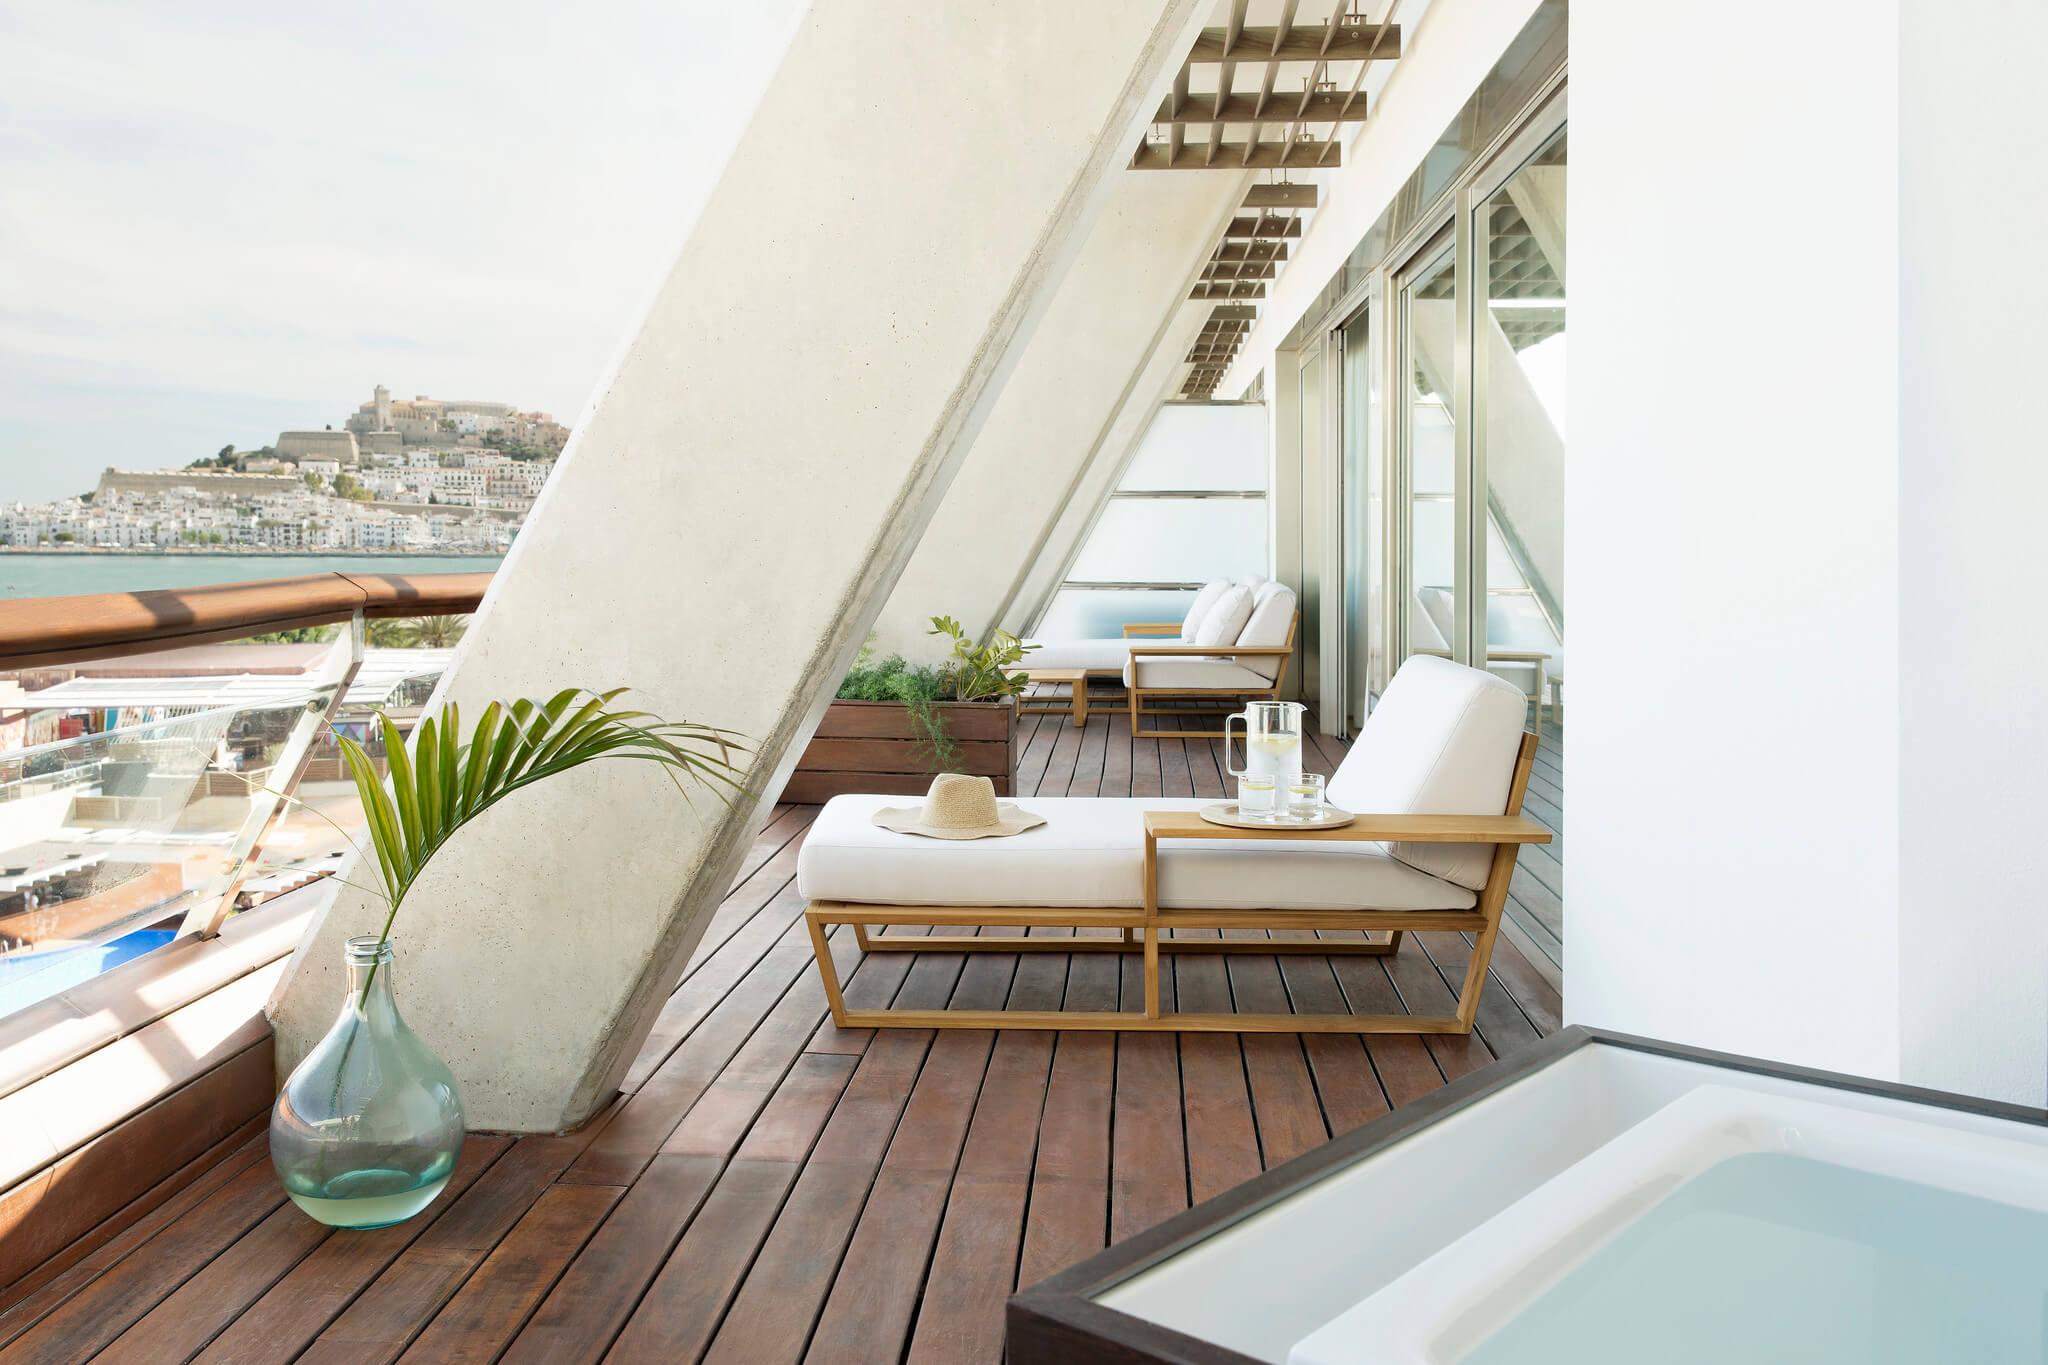 https://www.white-ibiza.com/wp-content/uploads/2020/02/white-ibiza-hotels-ibiza-gran-hotel-2020-12.jpg